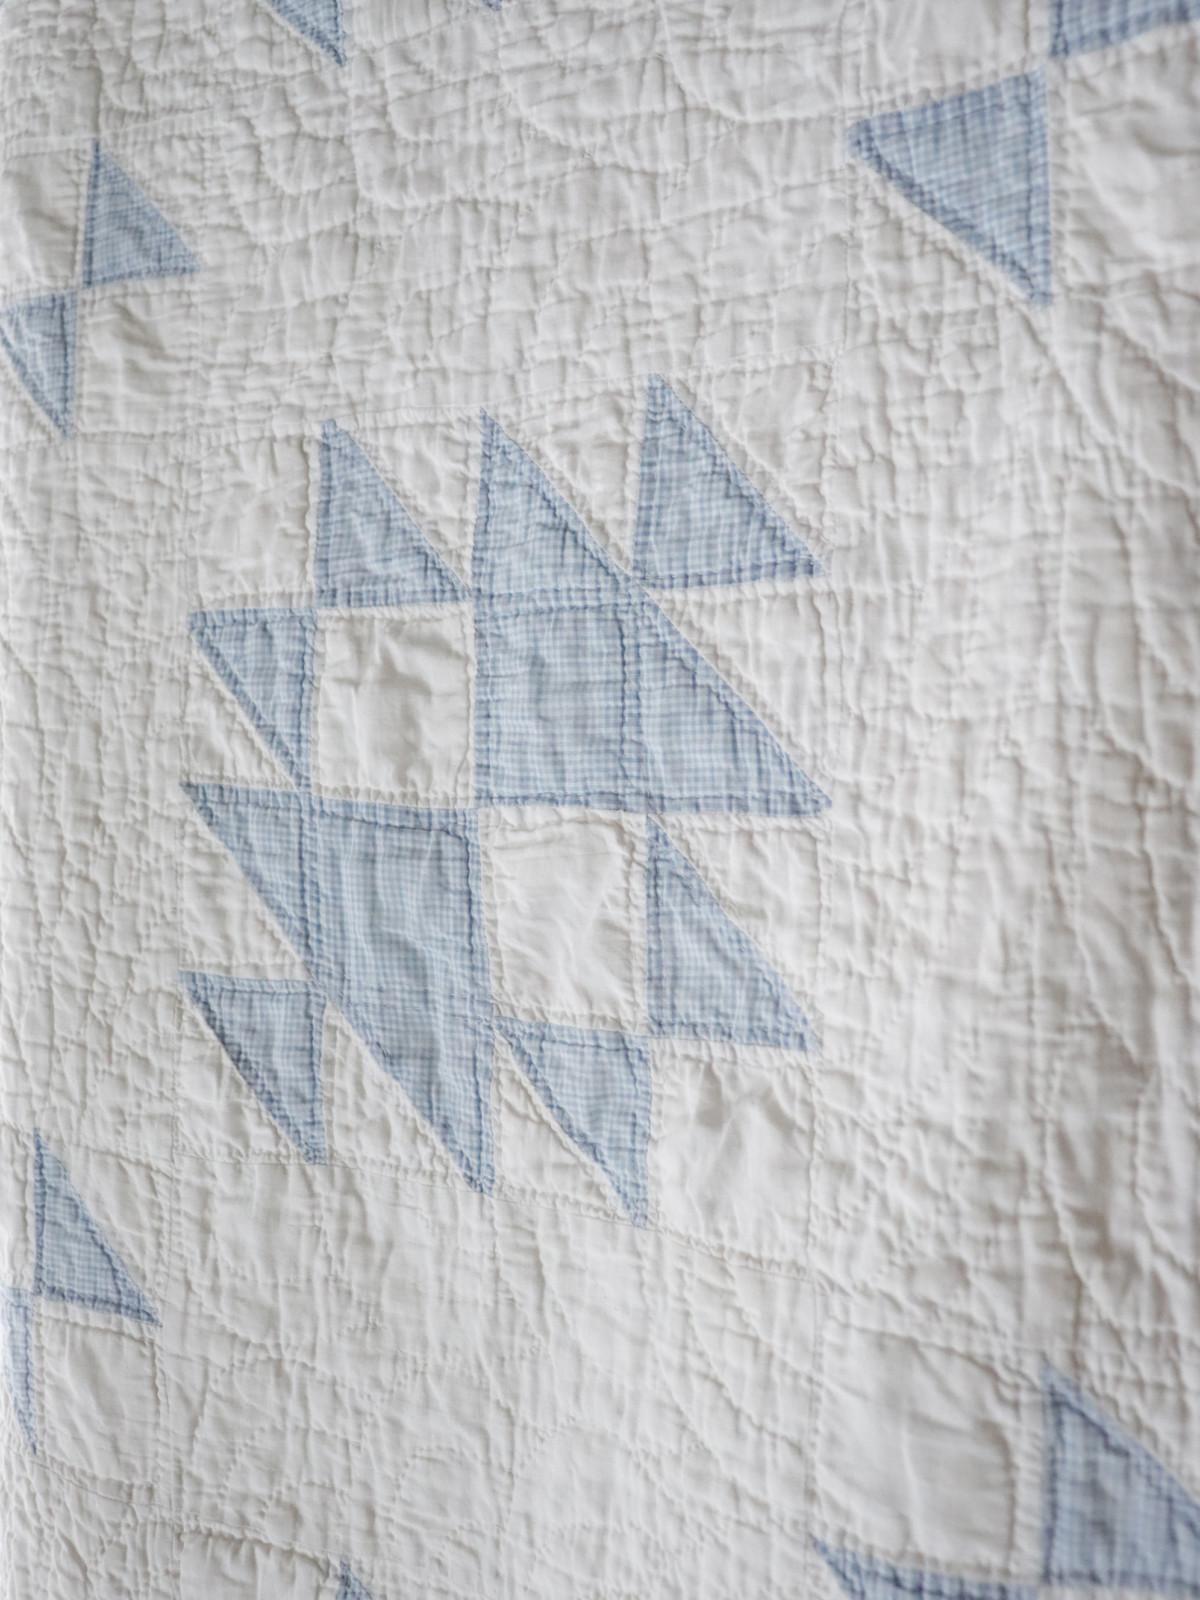 Vintage,handmade,quilt,usa